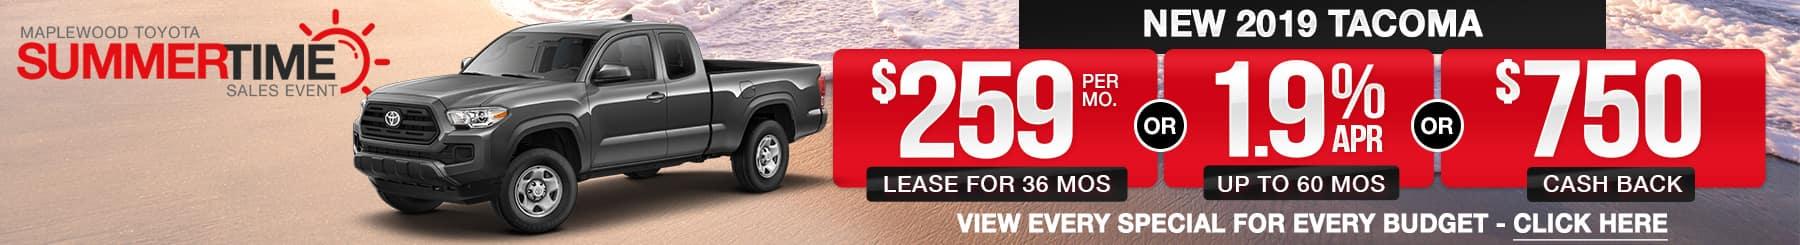 Toyota Tacoma Lease Finance Offers